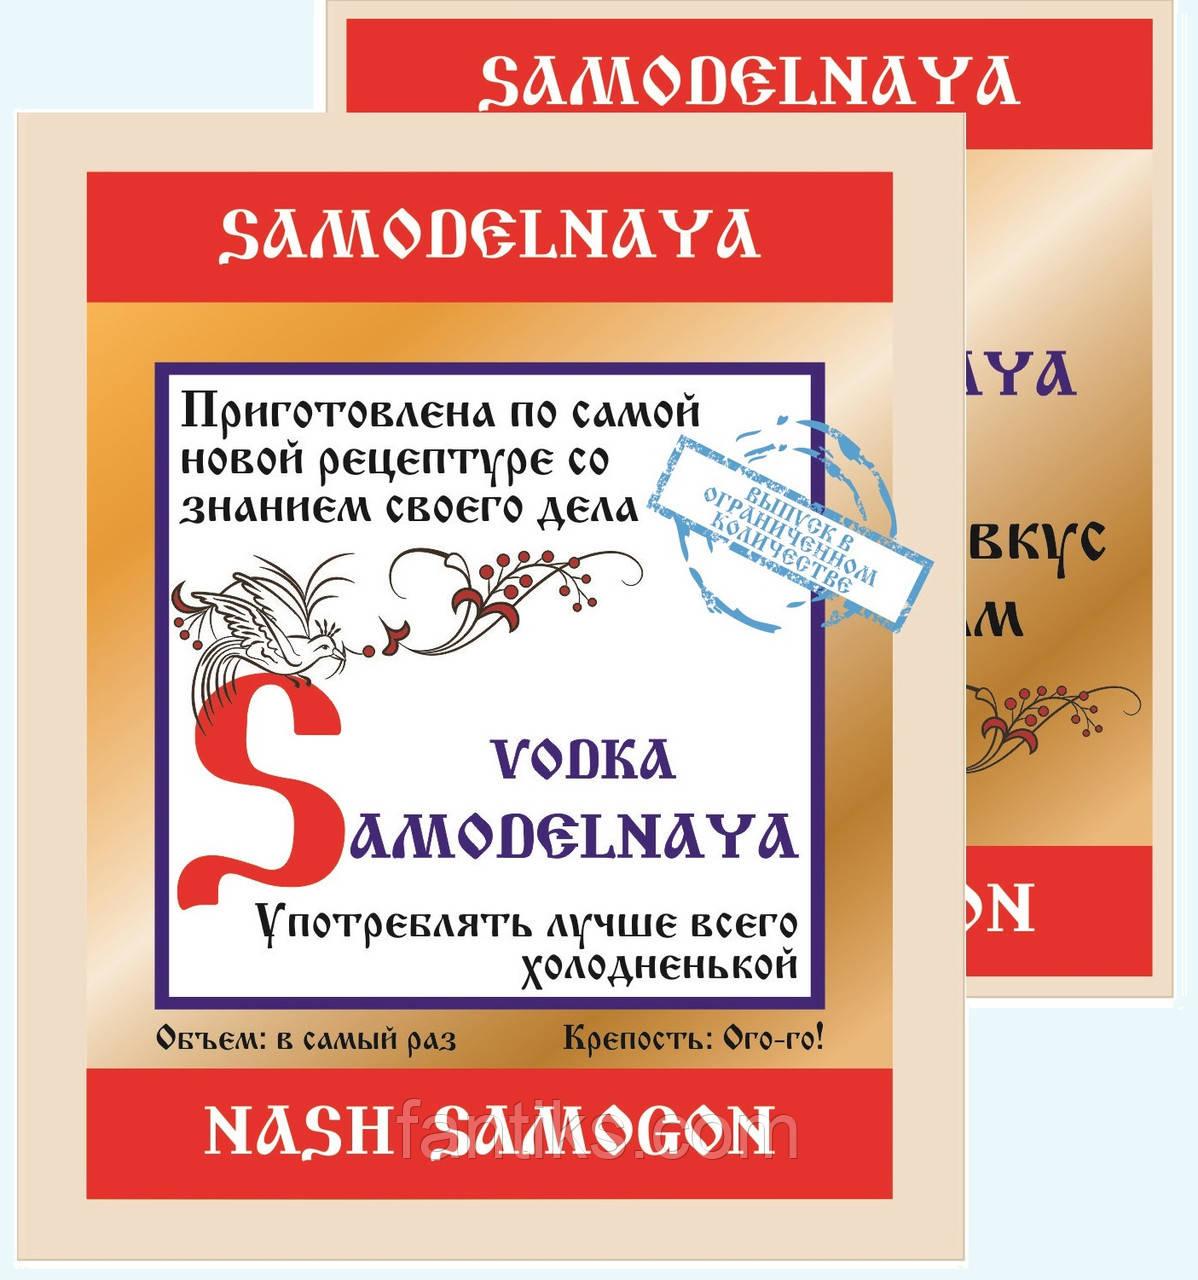 Vodka Samodelnaya - комплект наклейок на пляшку